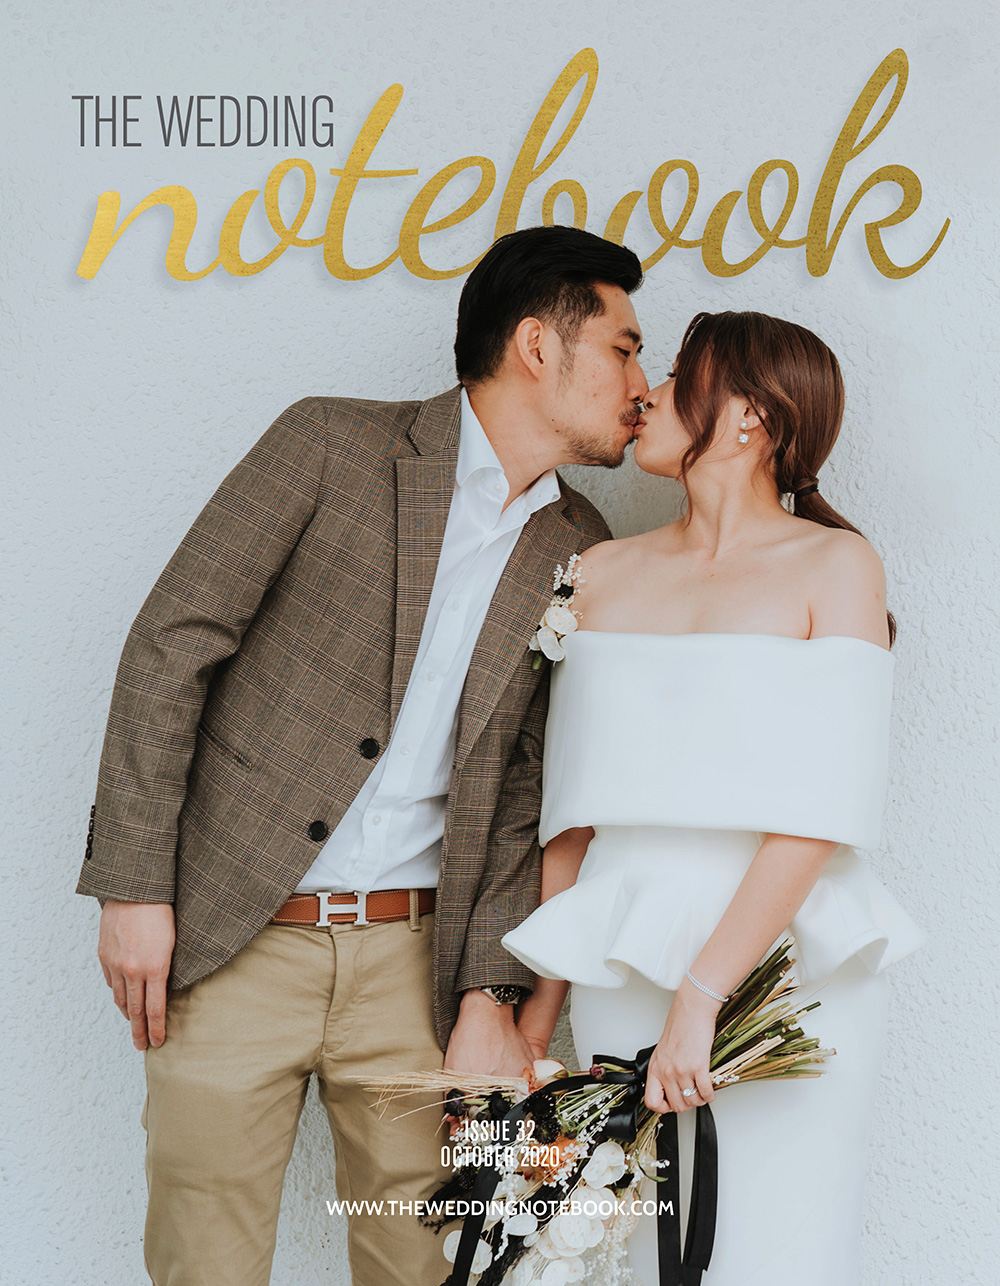 The Wedding Notebook October issue. www.theweddingnotebook.com